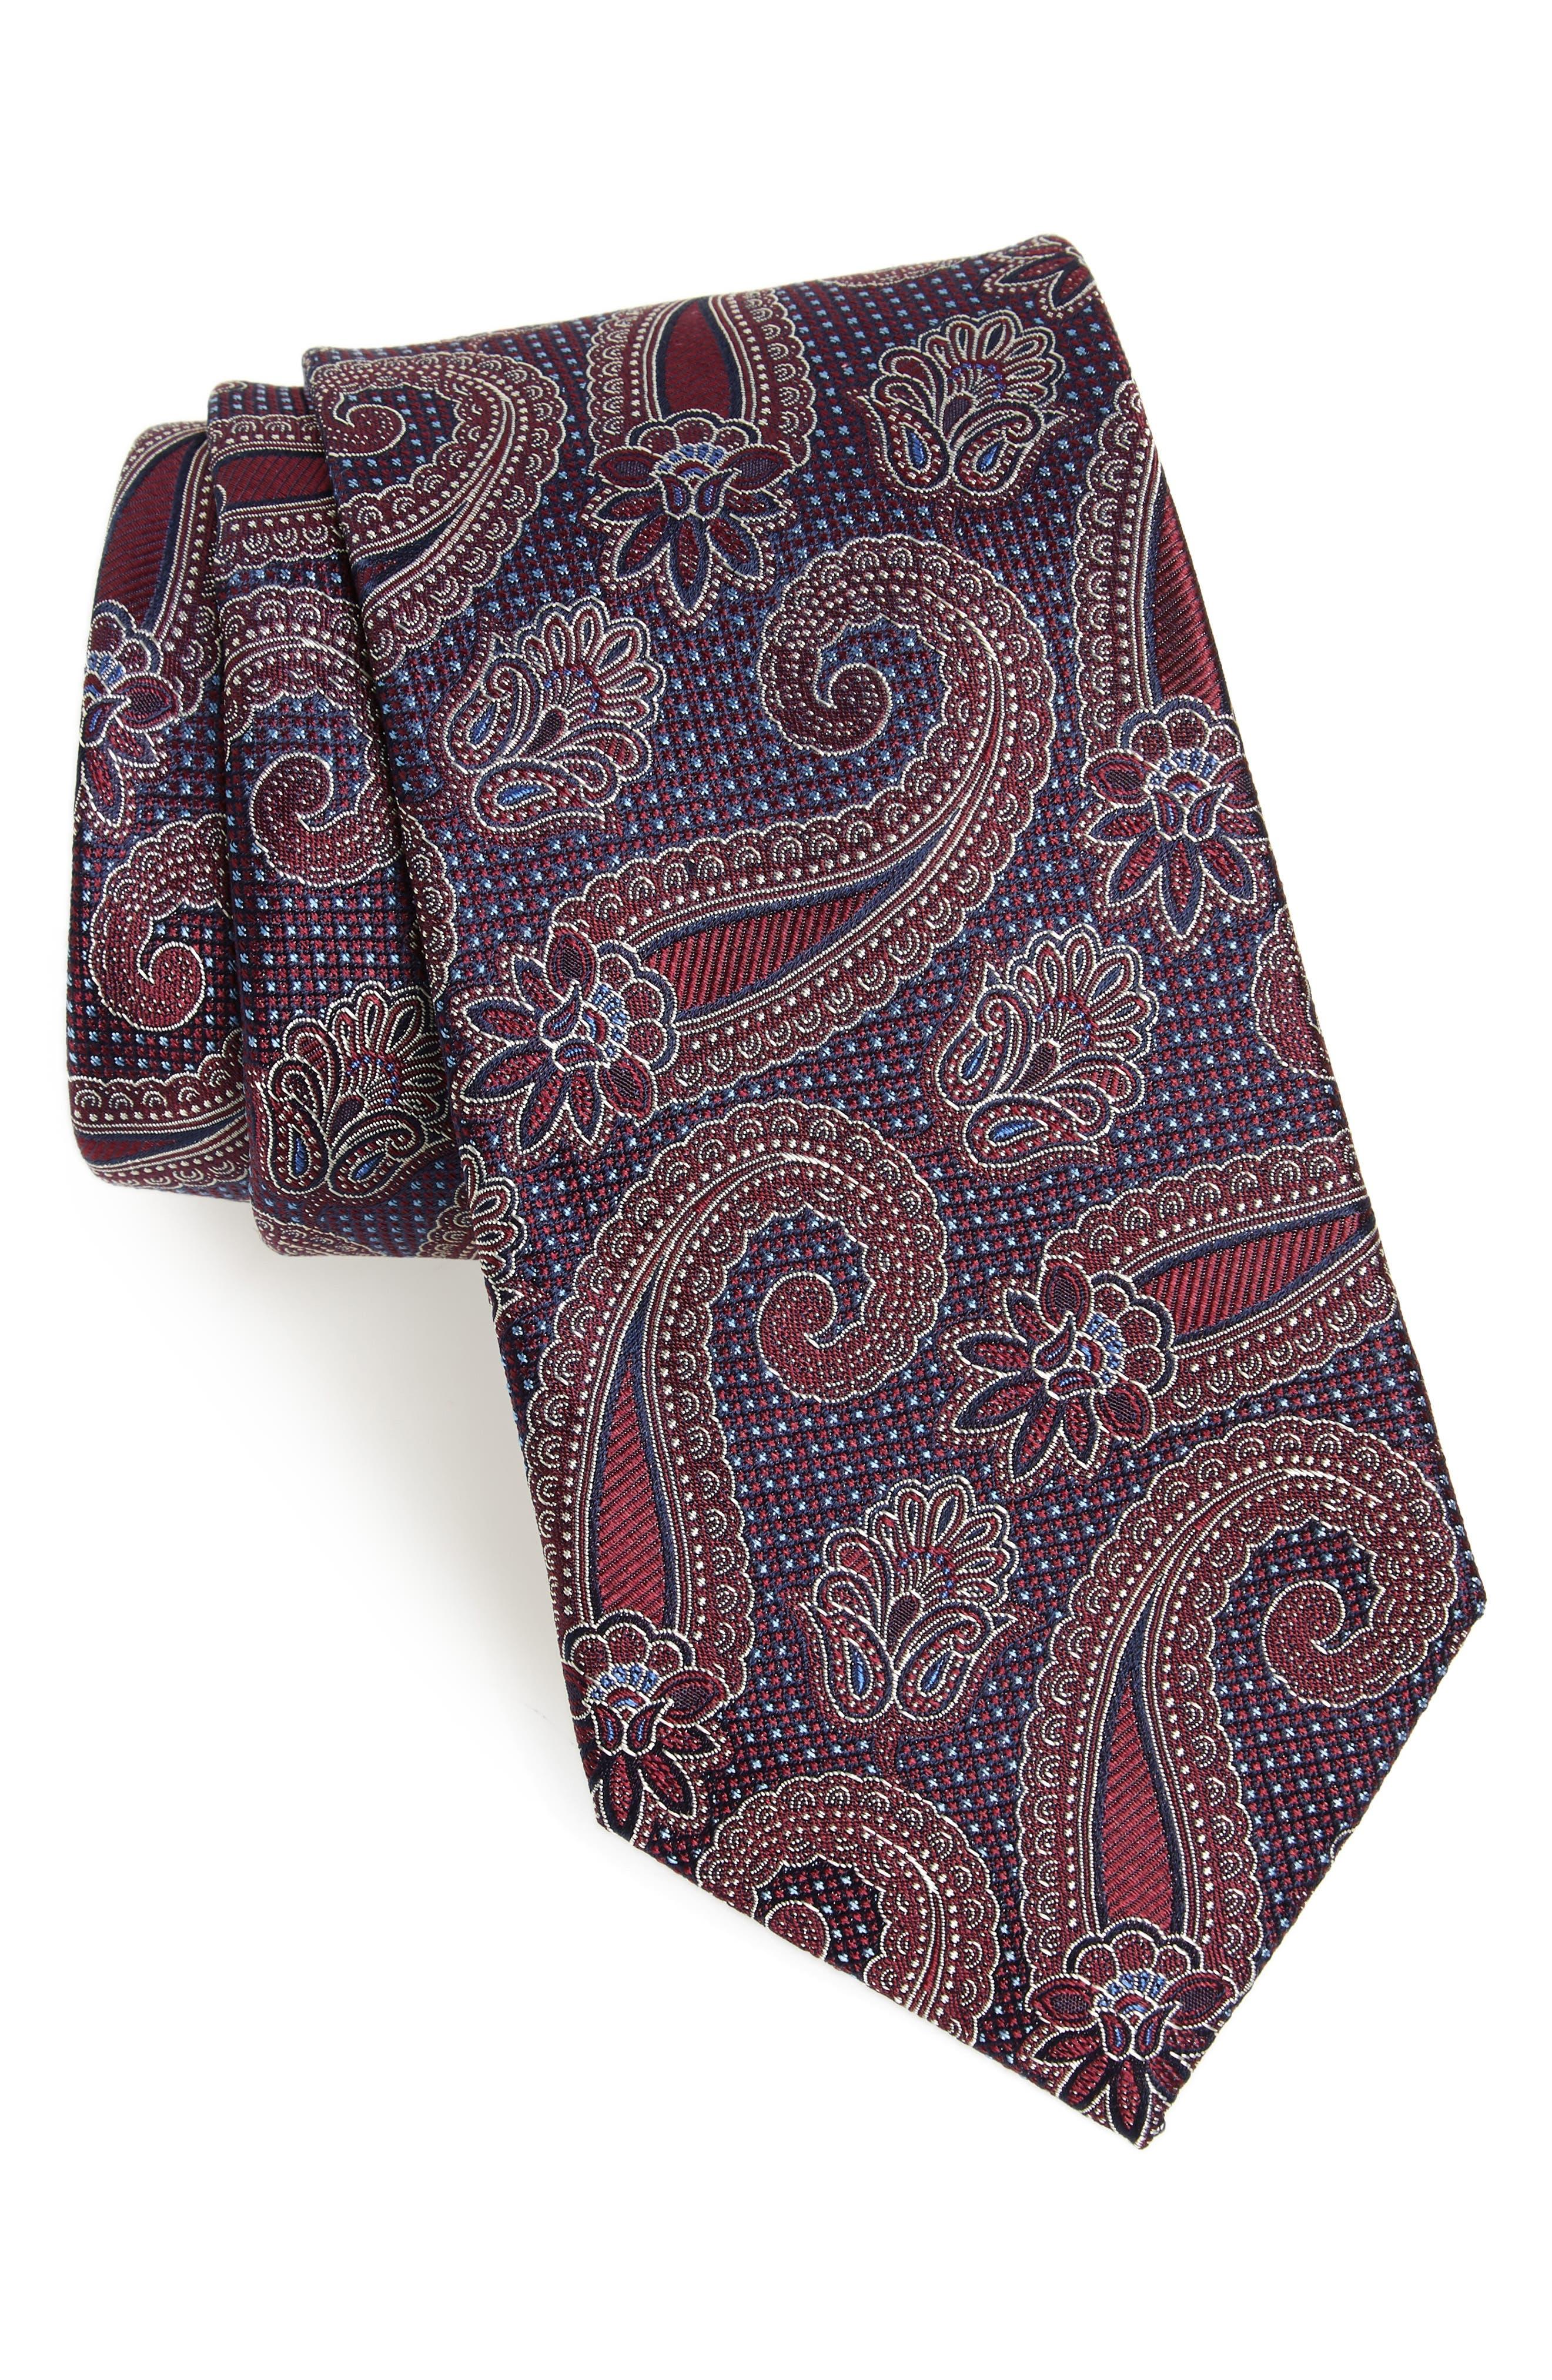 1920s Bow Ties | Gatsby Tie,  Art Deco Tie Mens Nordstrom Mens Shop Emery Paisley Silk Tie Size Regular - Burgundy $79.50 AT vintagedancer.com